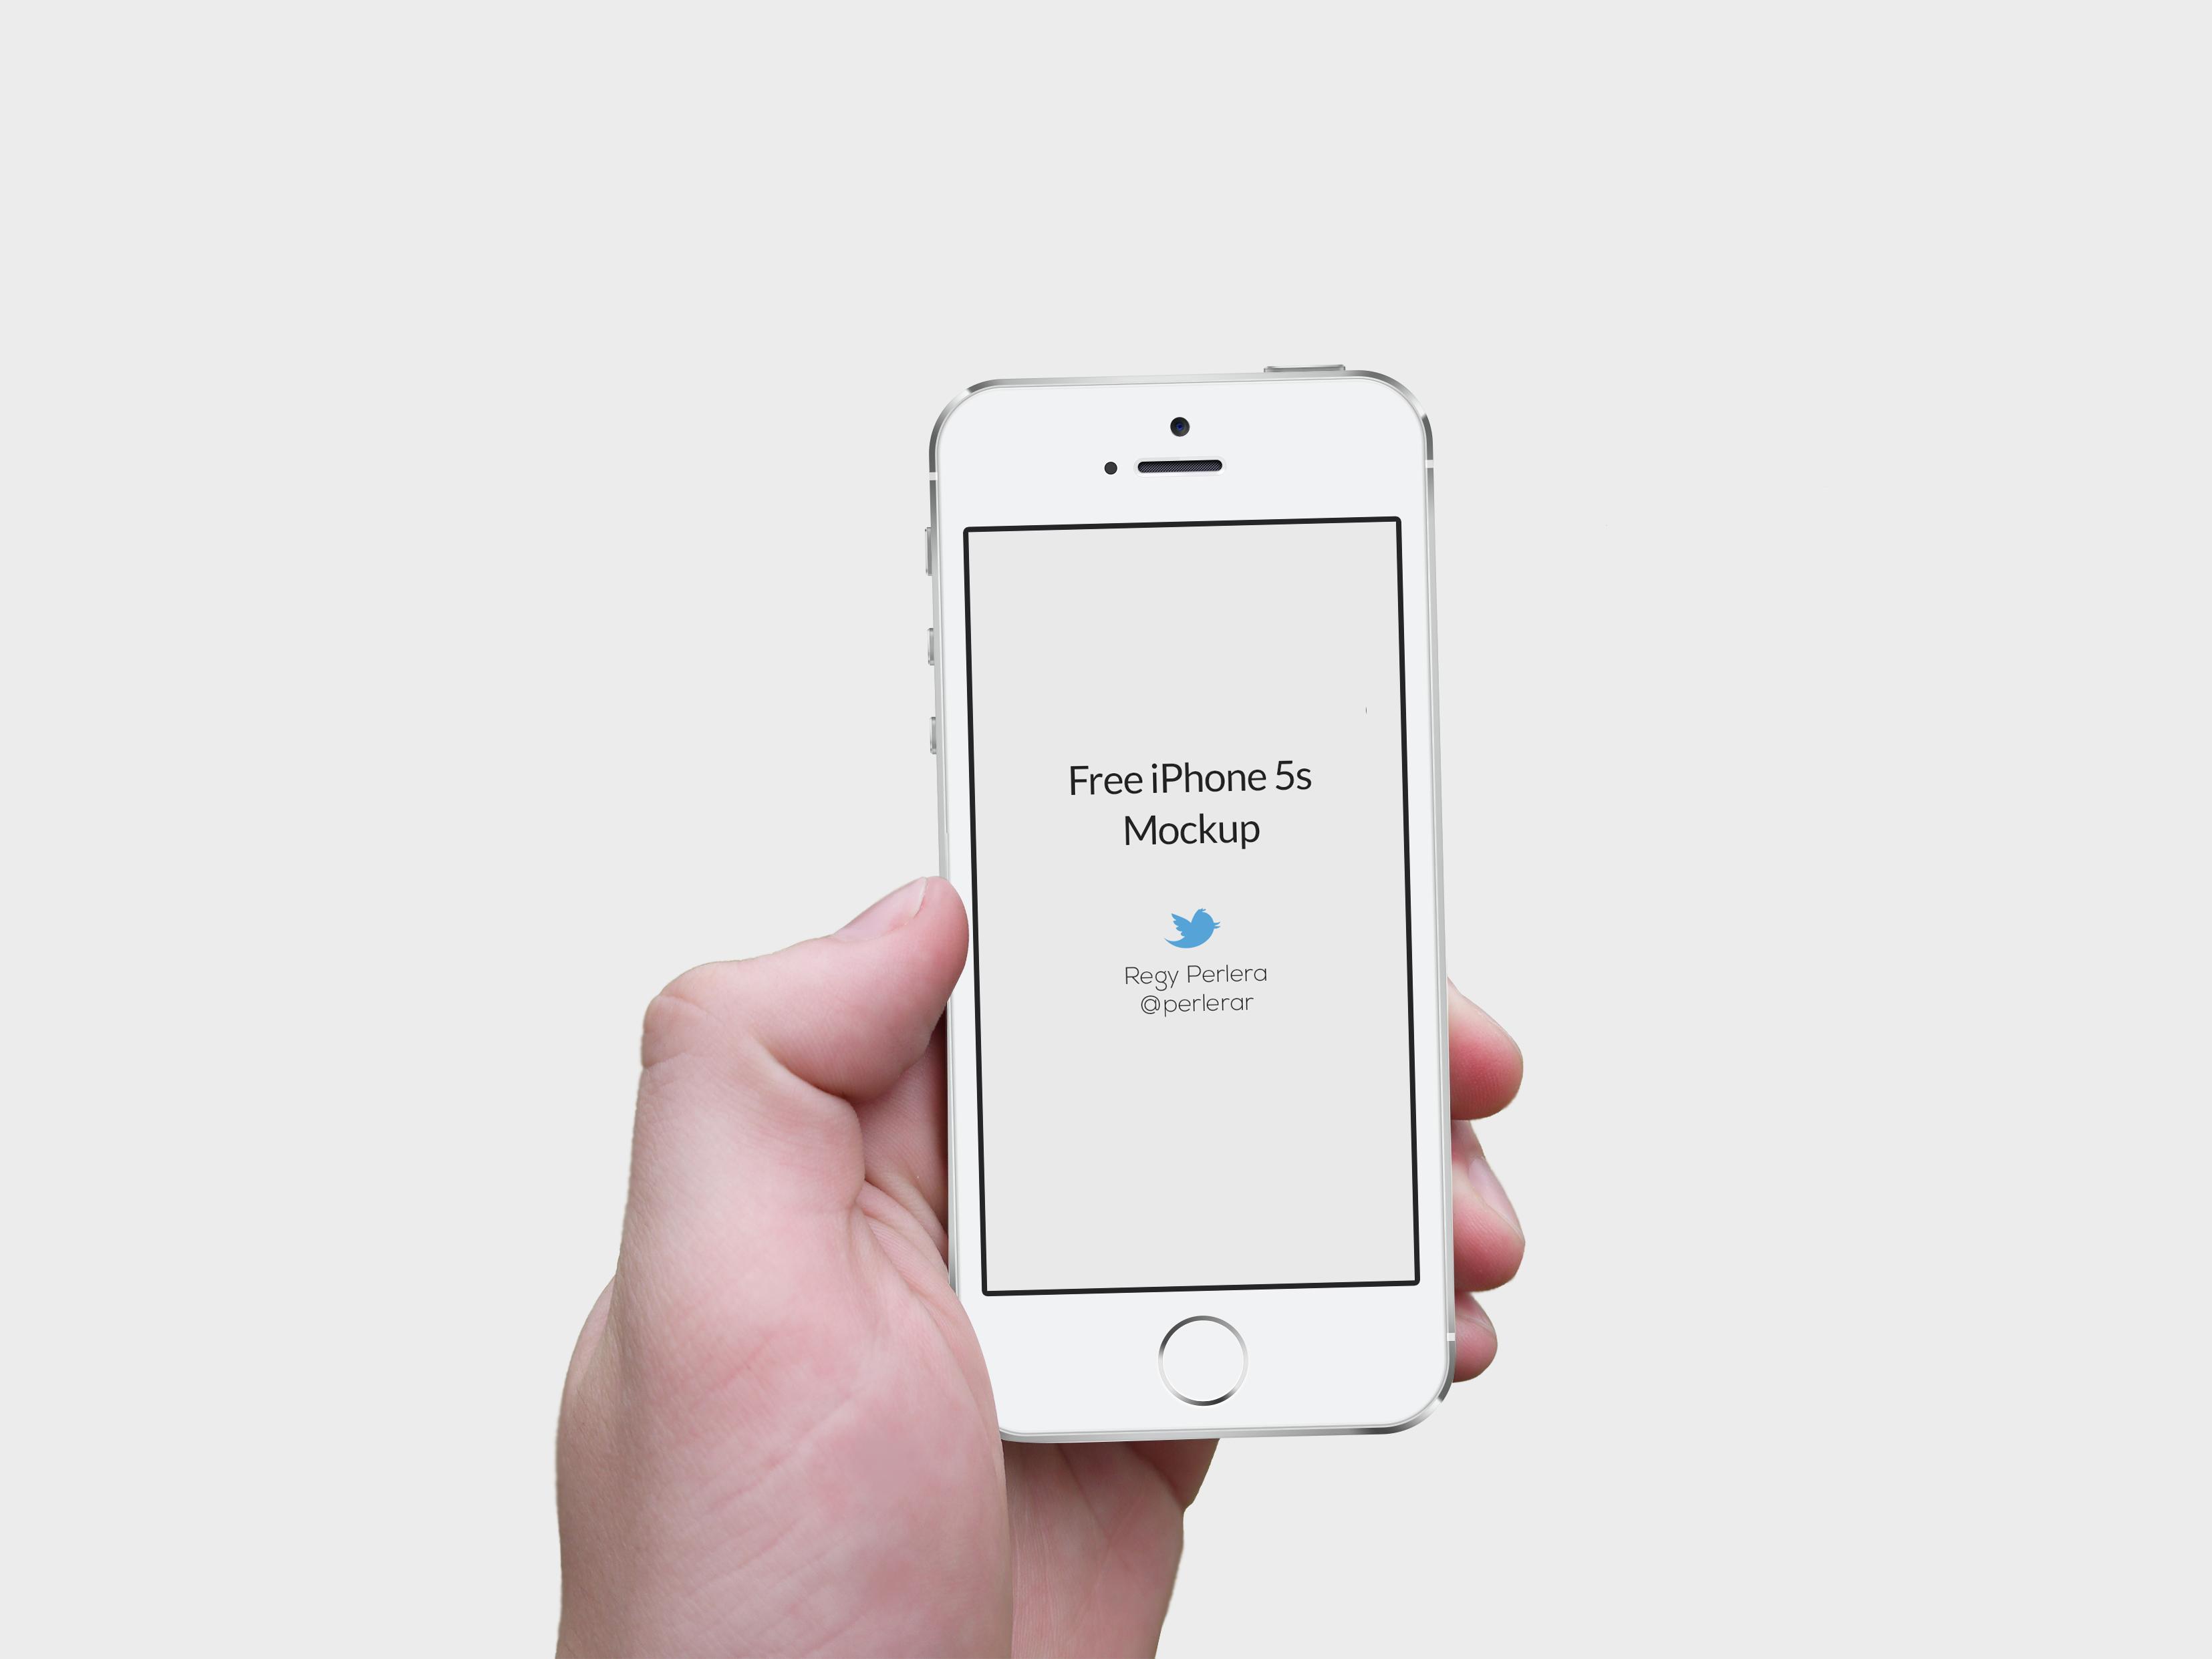 iPad iPhone 5s Mockups Template PSD PSDVectorIcons 3310x2483